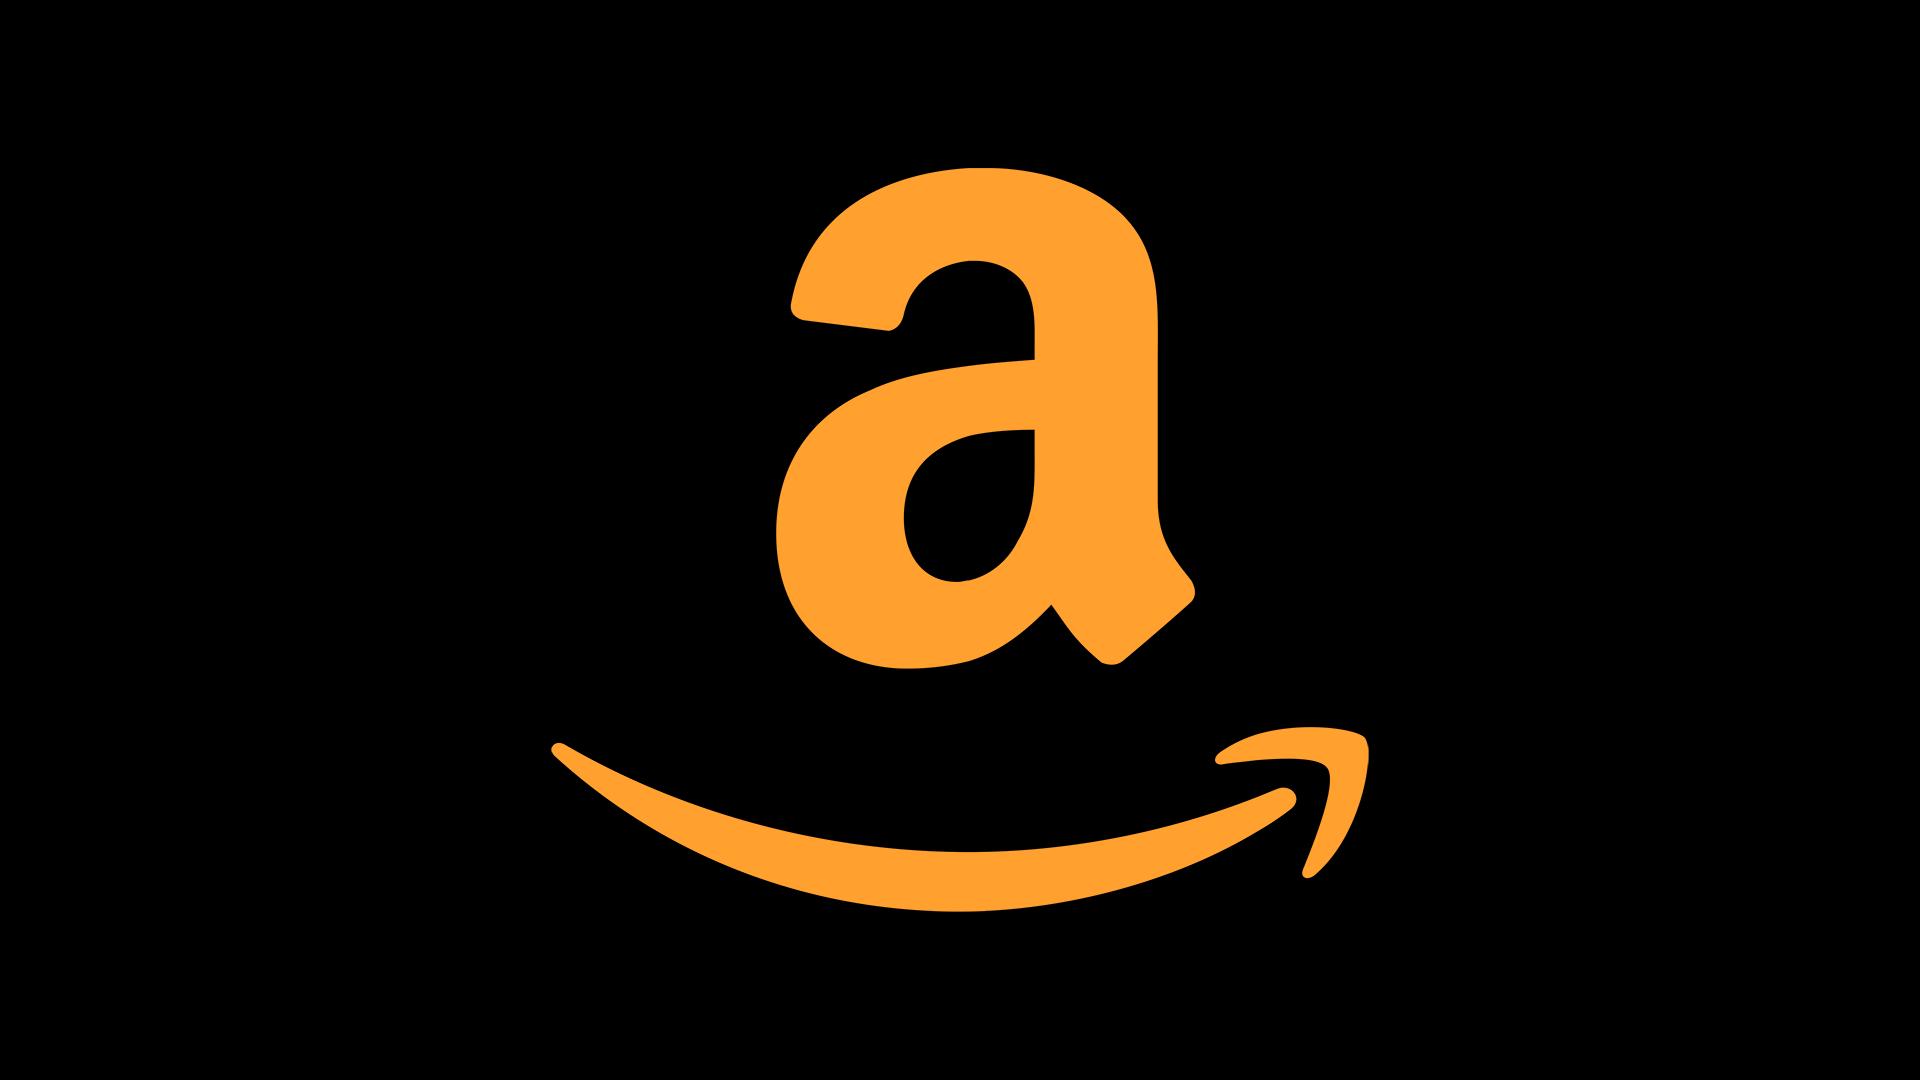 amazon-orange-1920